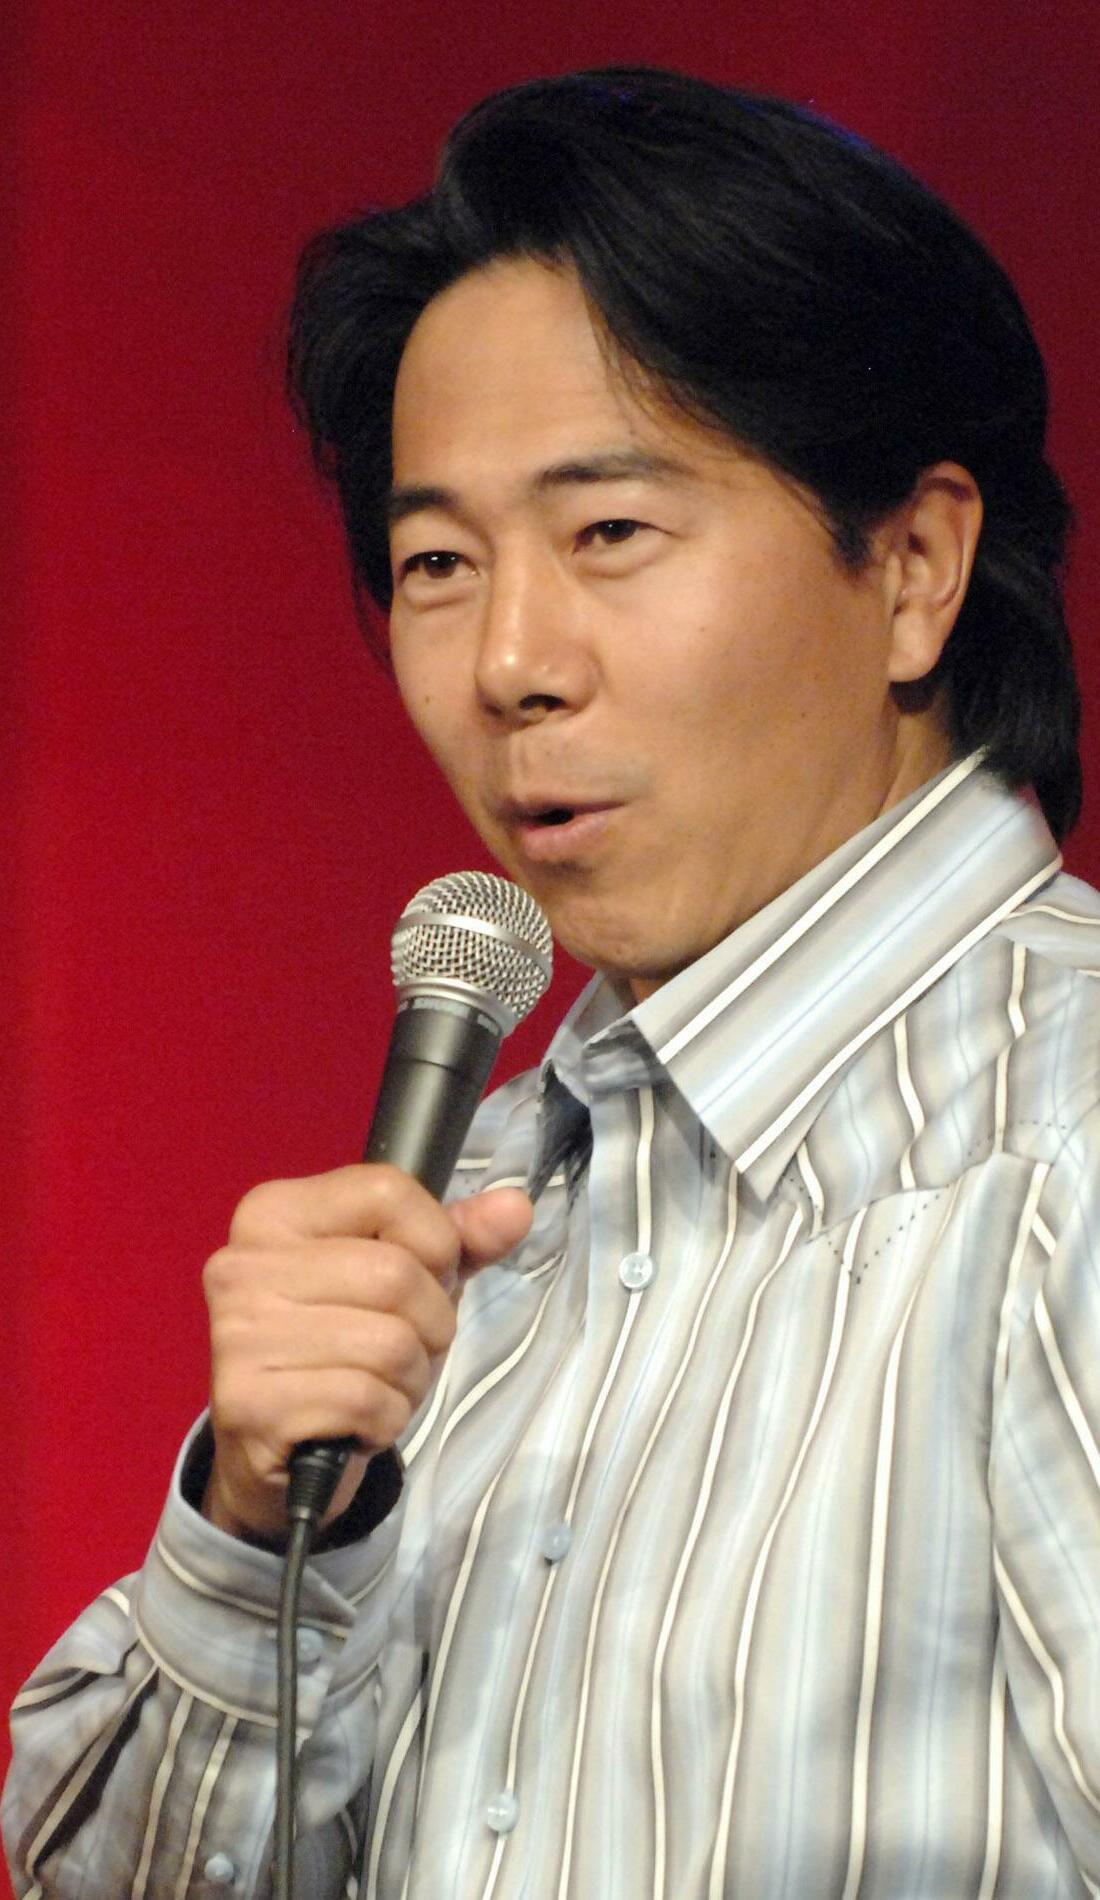 A Henry Cho live event